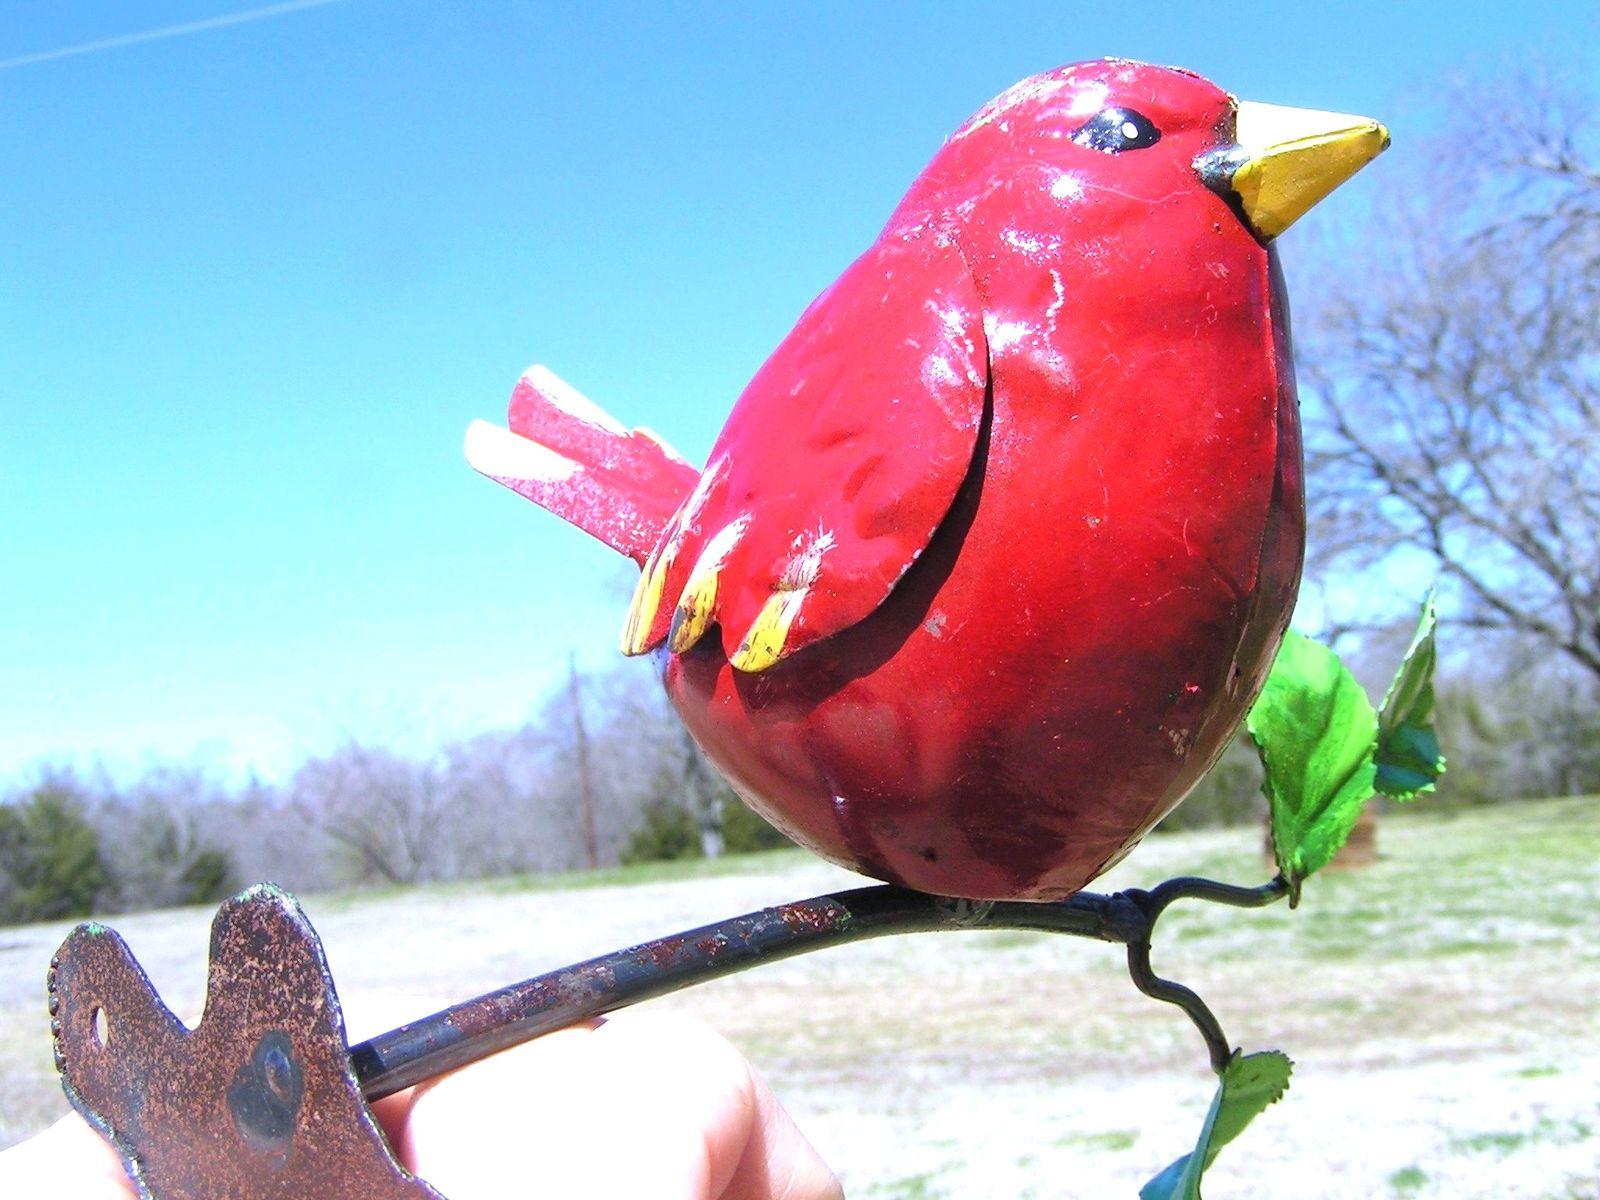 Metal art Red bird Cardinal on branch with mounting bracket